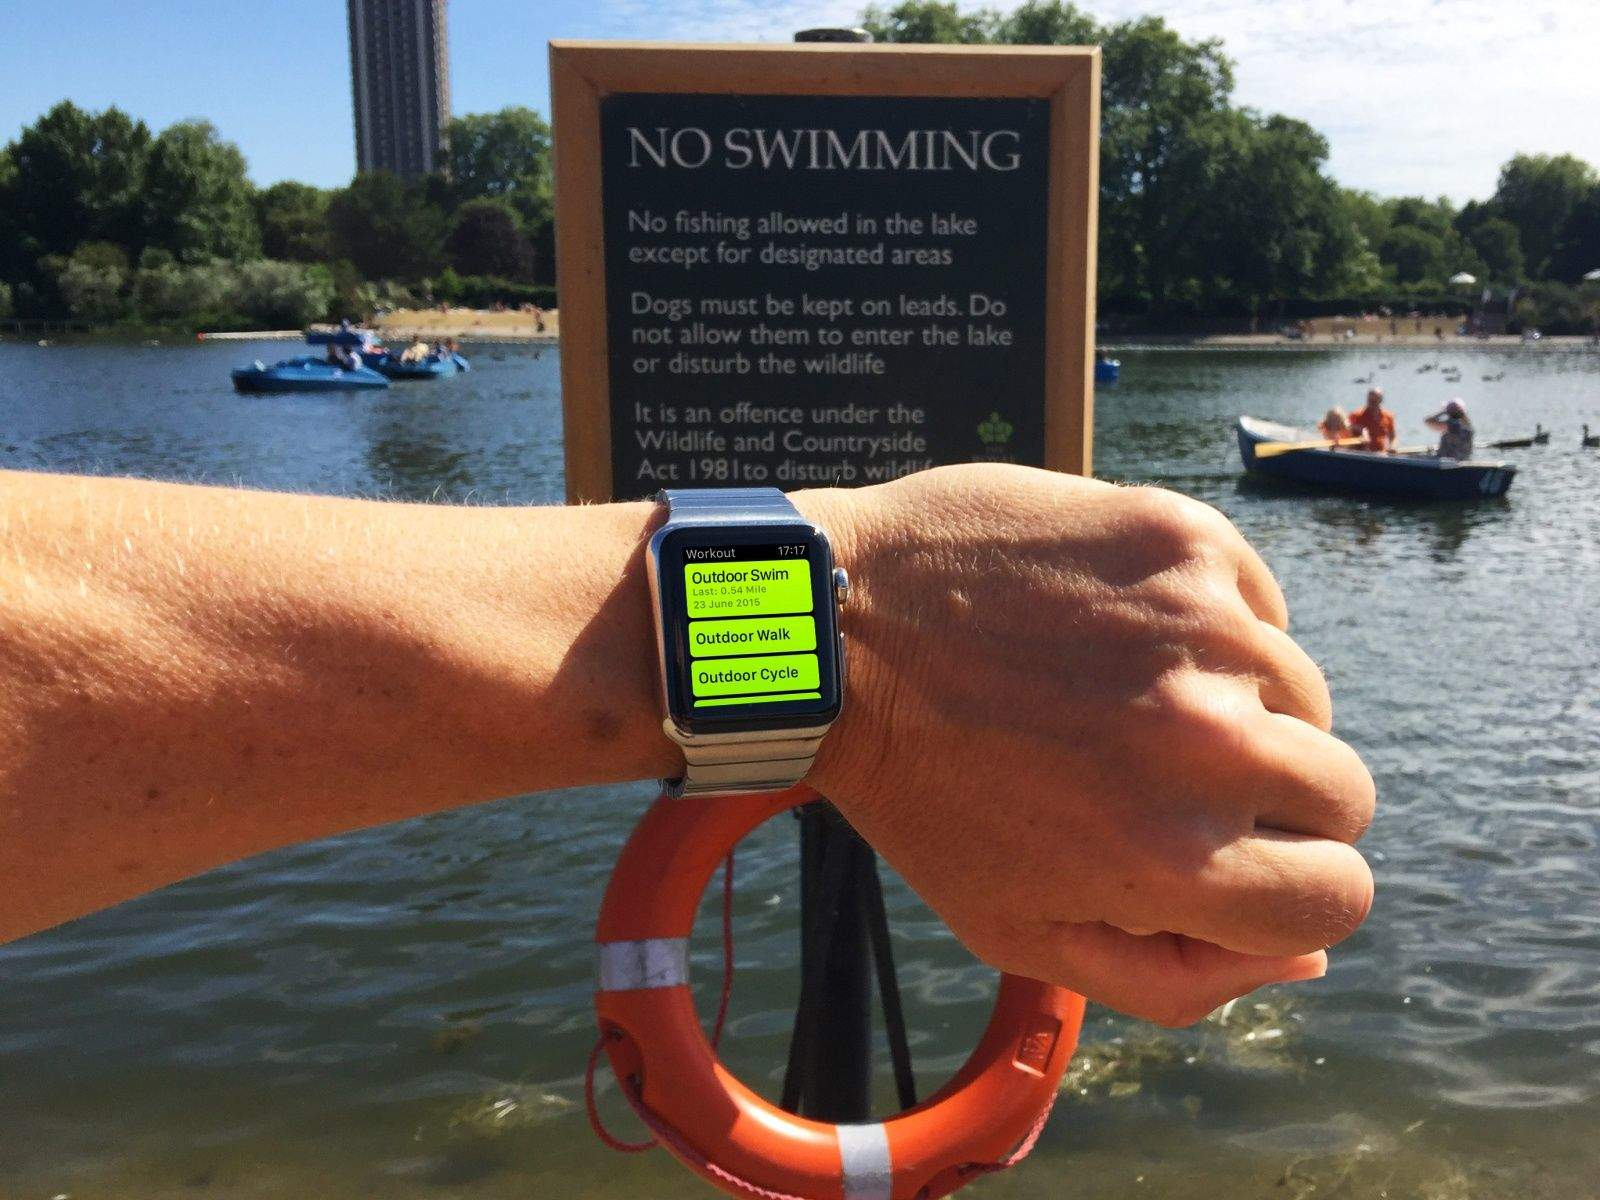 No swimming - Apple Watch is water resistant but not waterproof